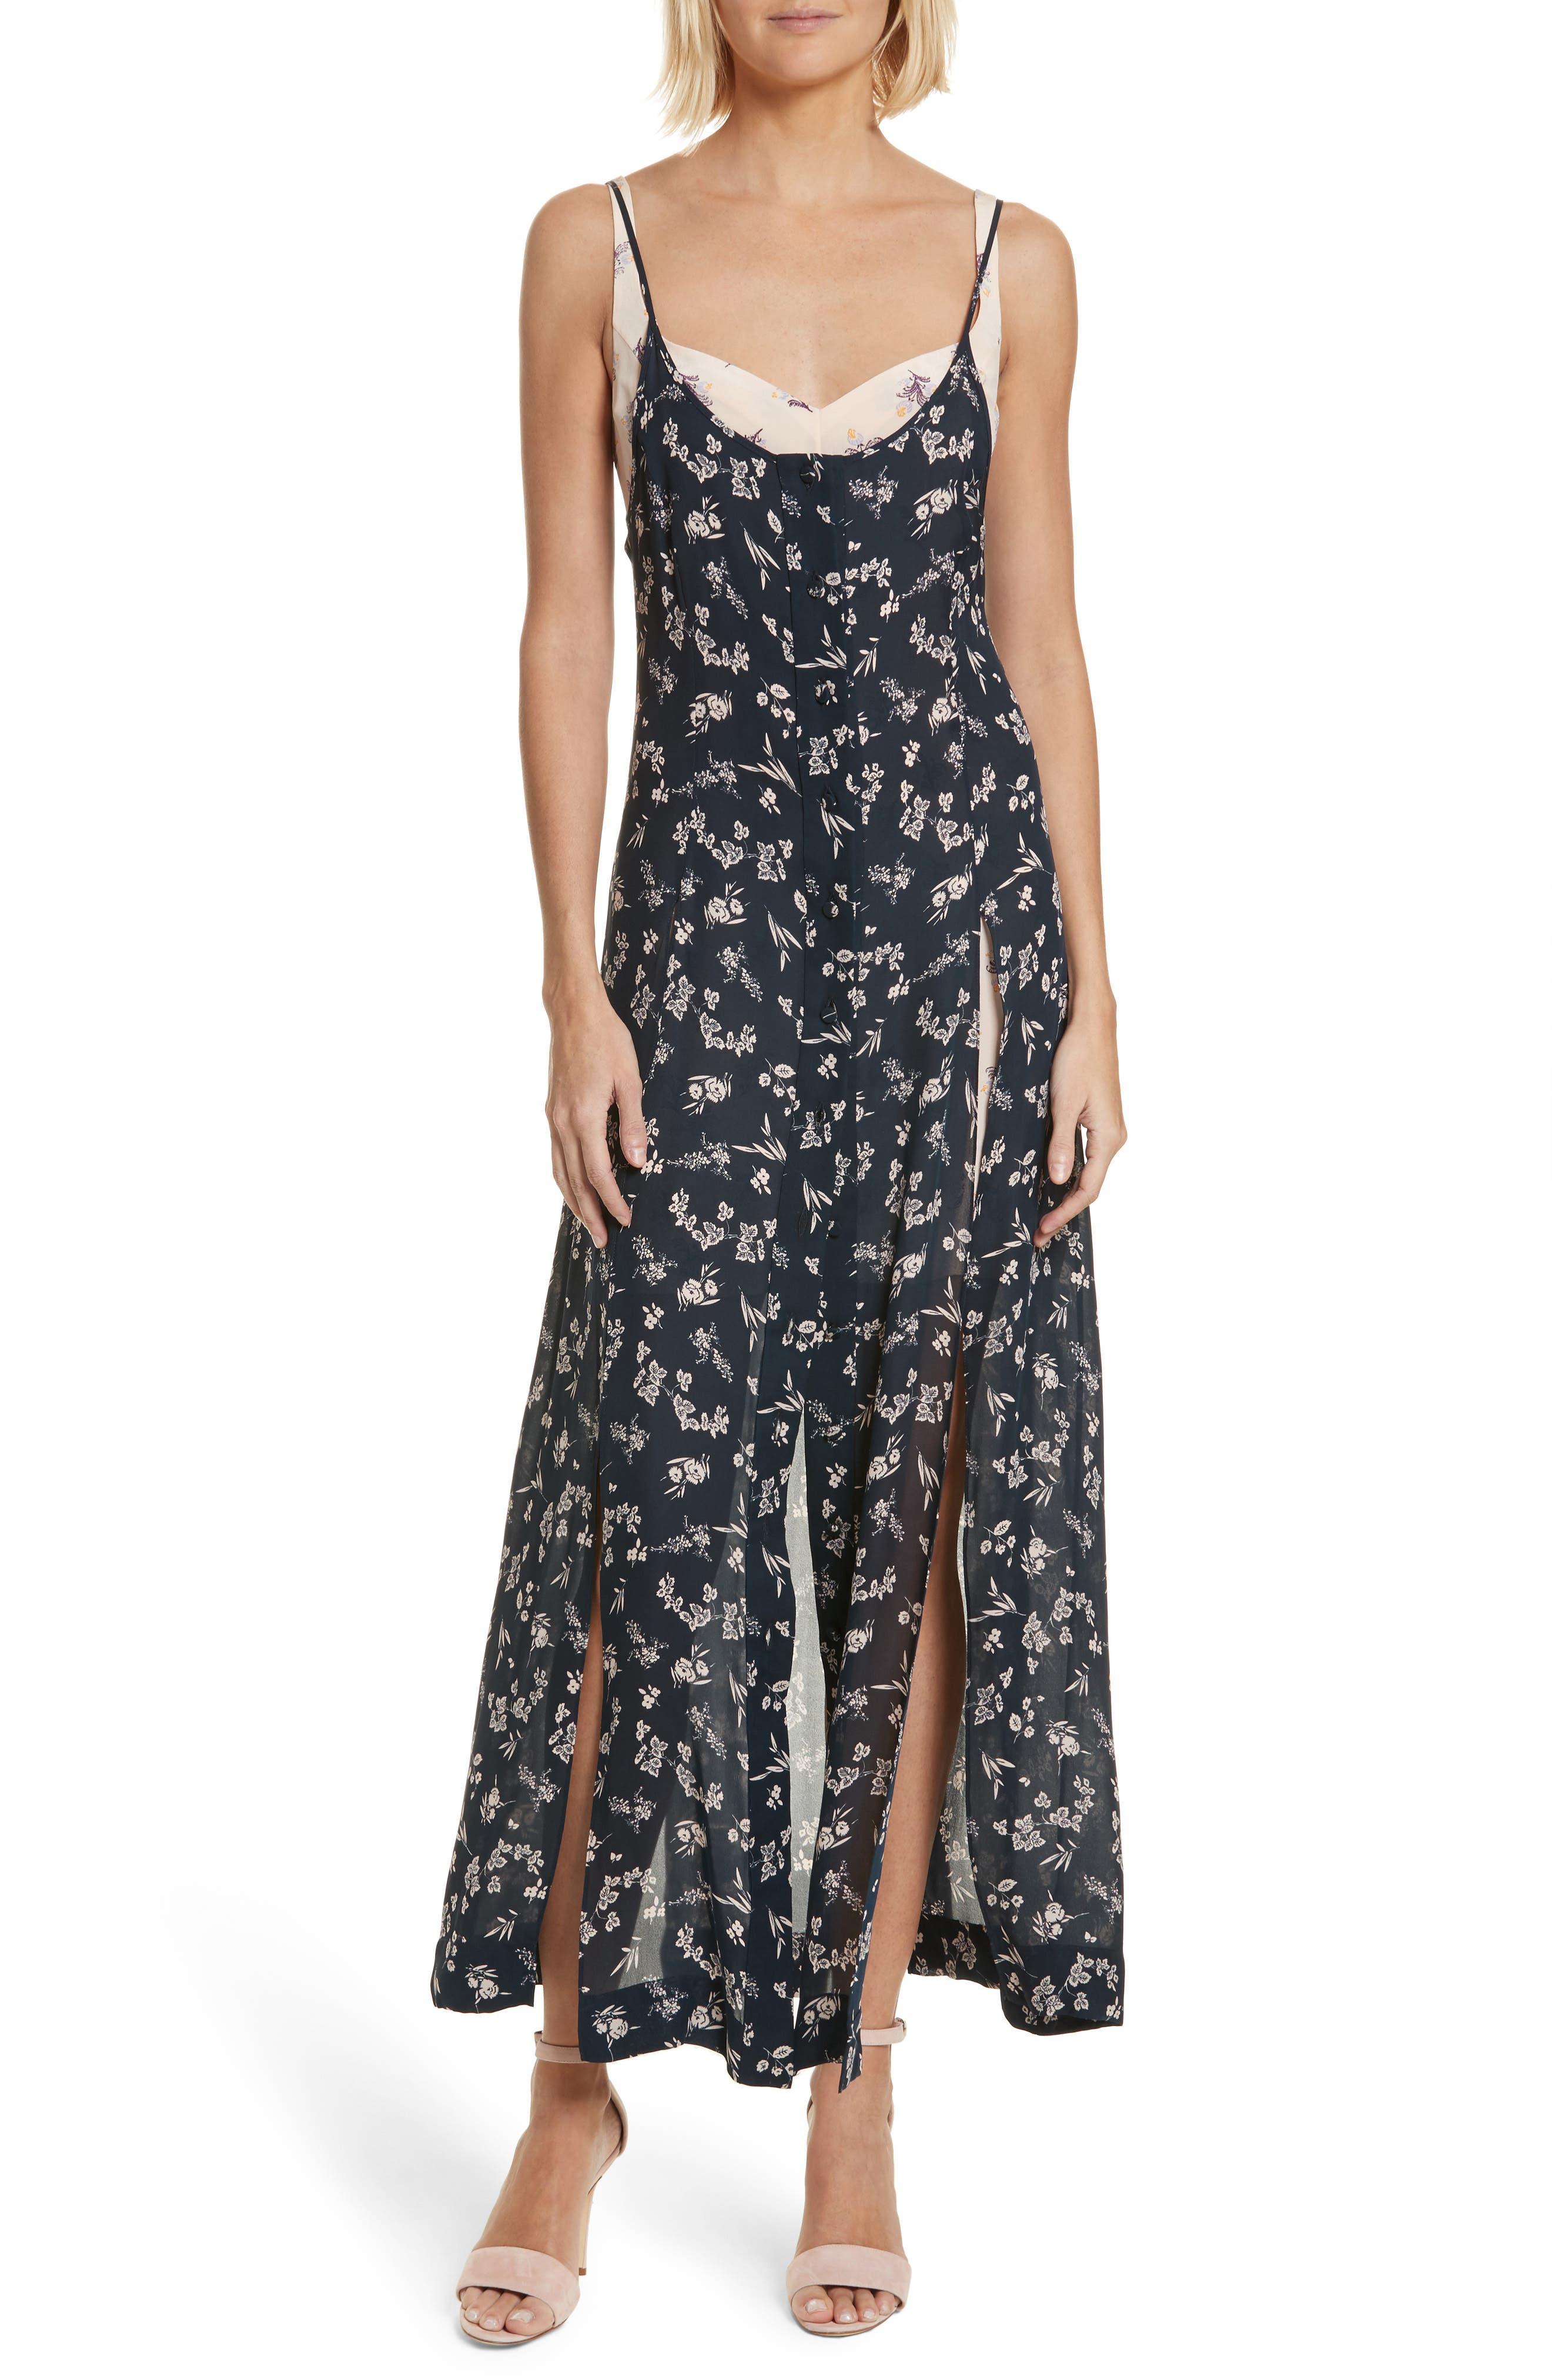 Cinq à Sept Jocelyn Floral Print Layered Silk Dress